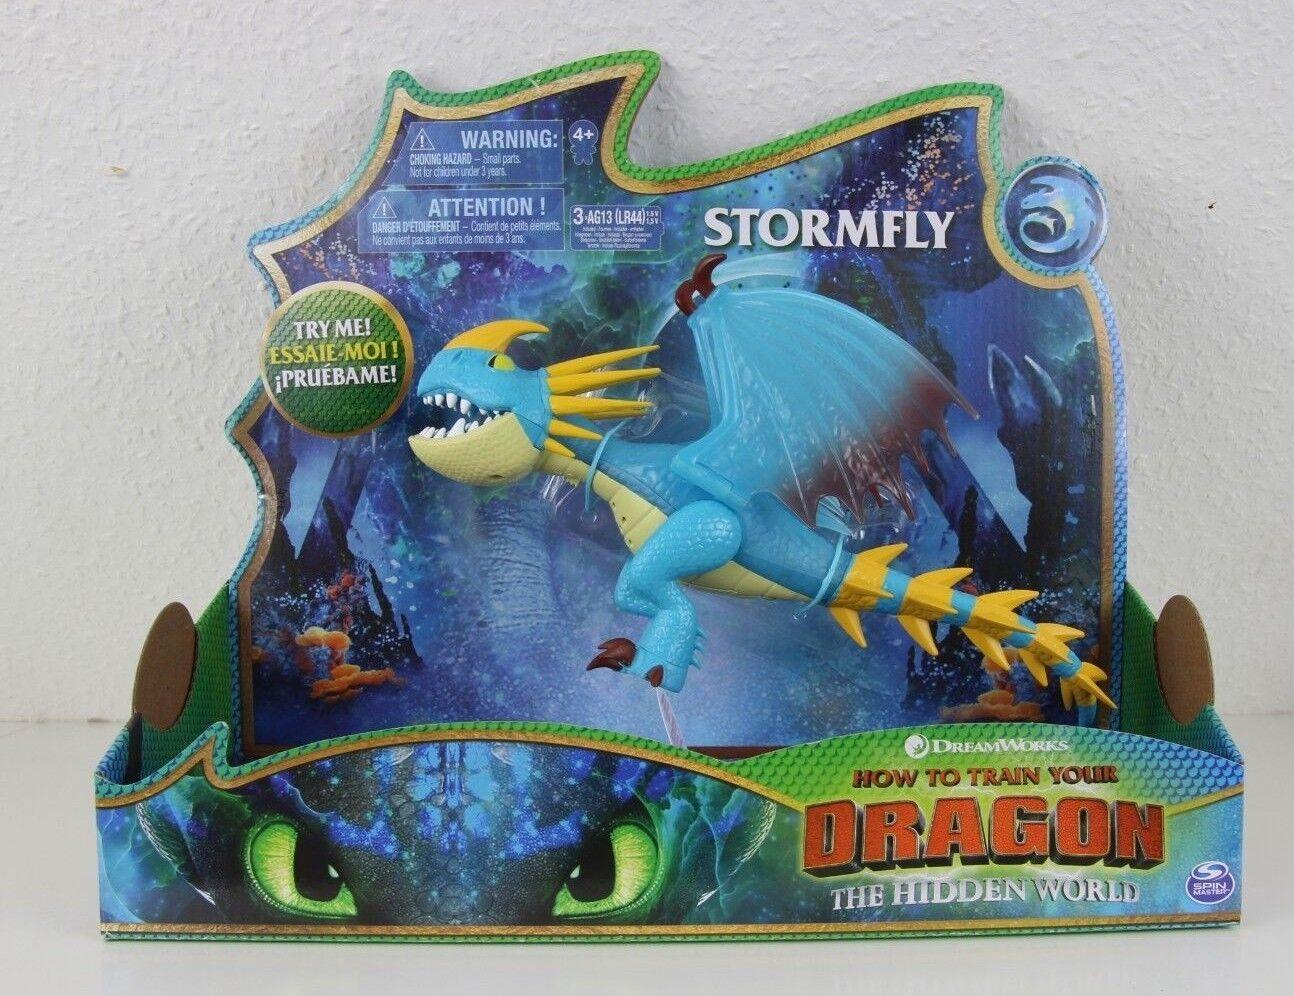 Stormfly drache - deluxe - drachen - drachenz ä hmen drachen 3 drachenreiter berk